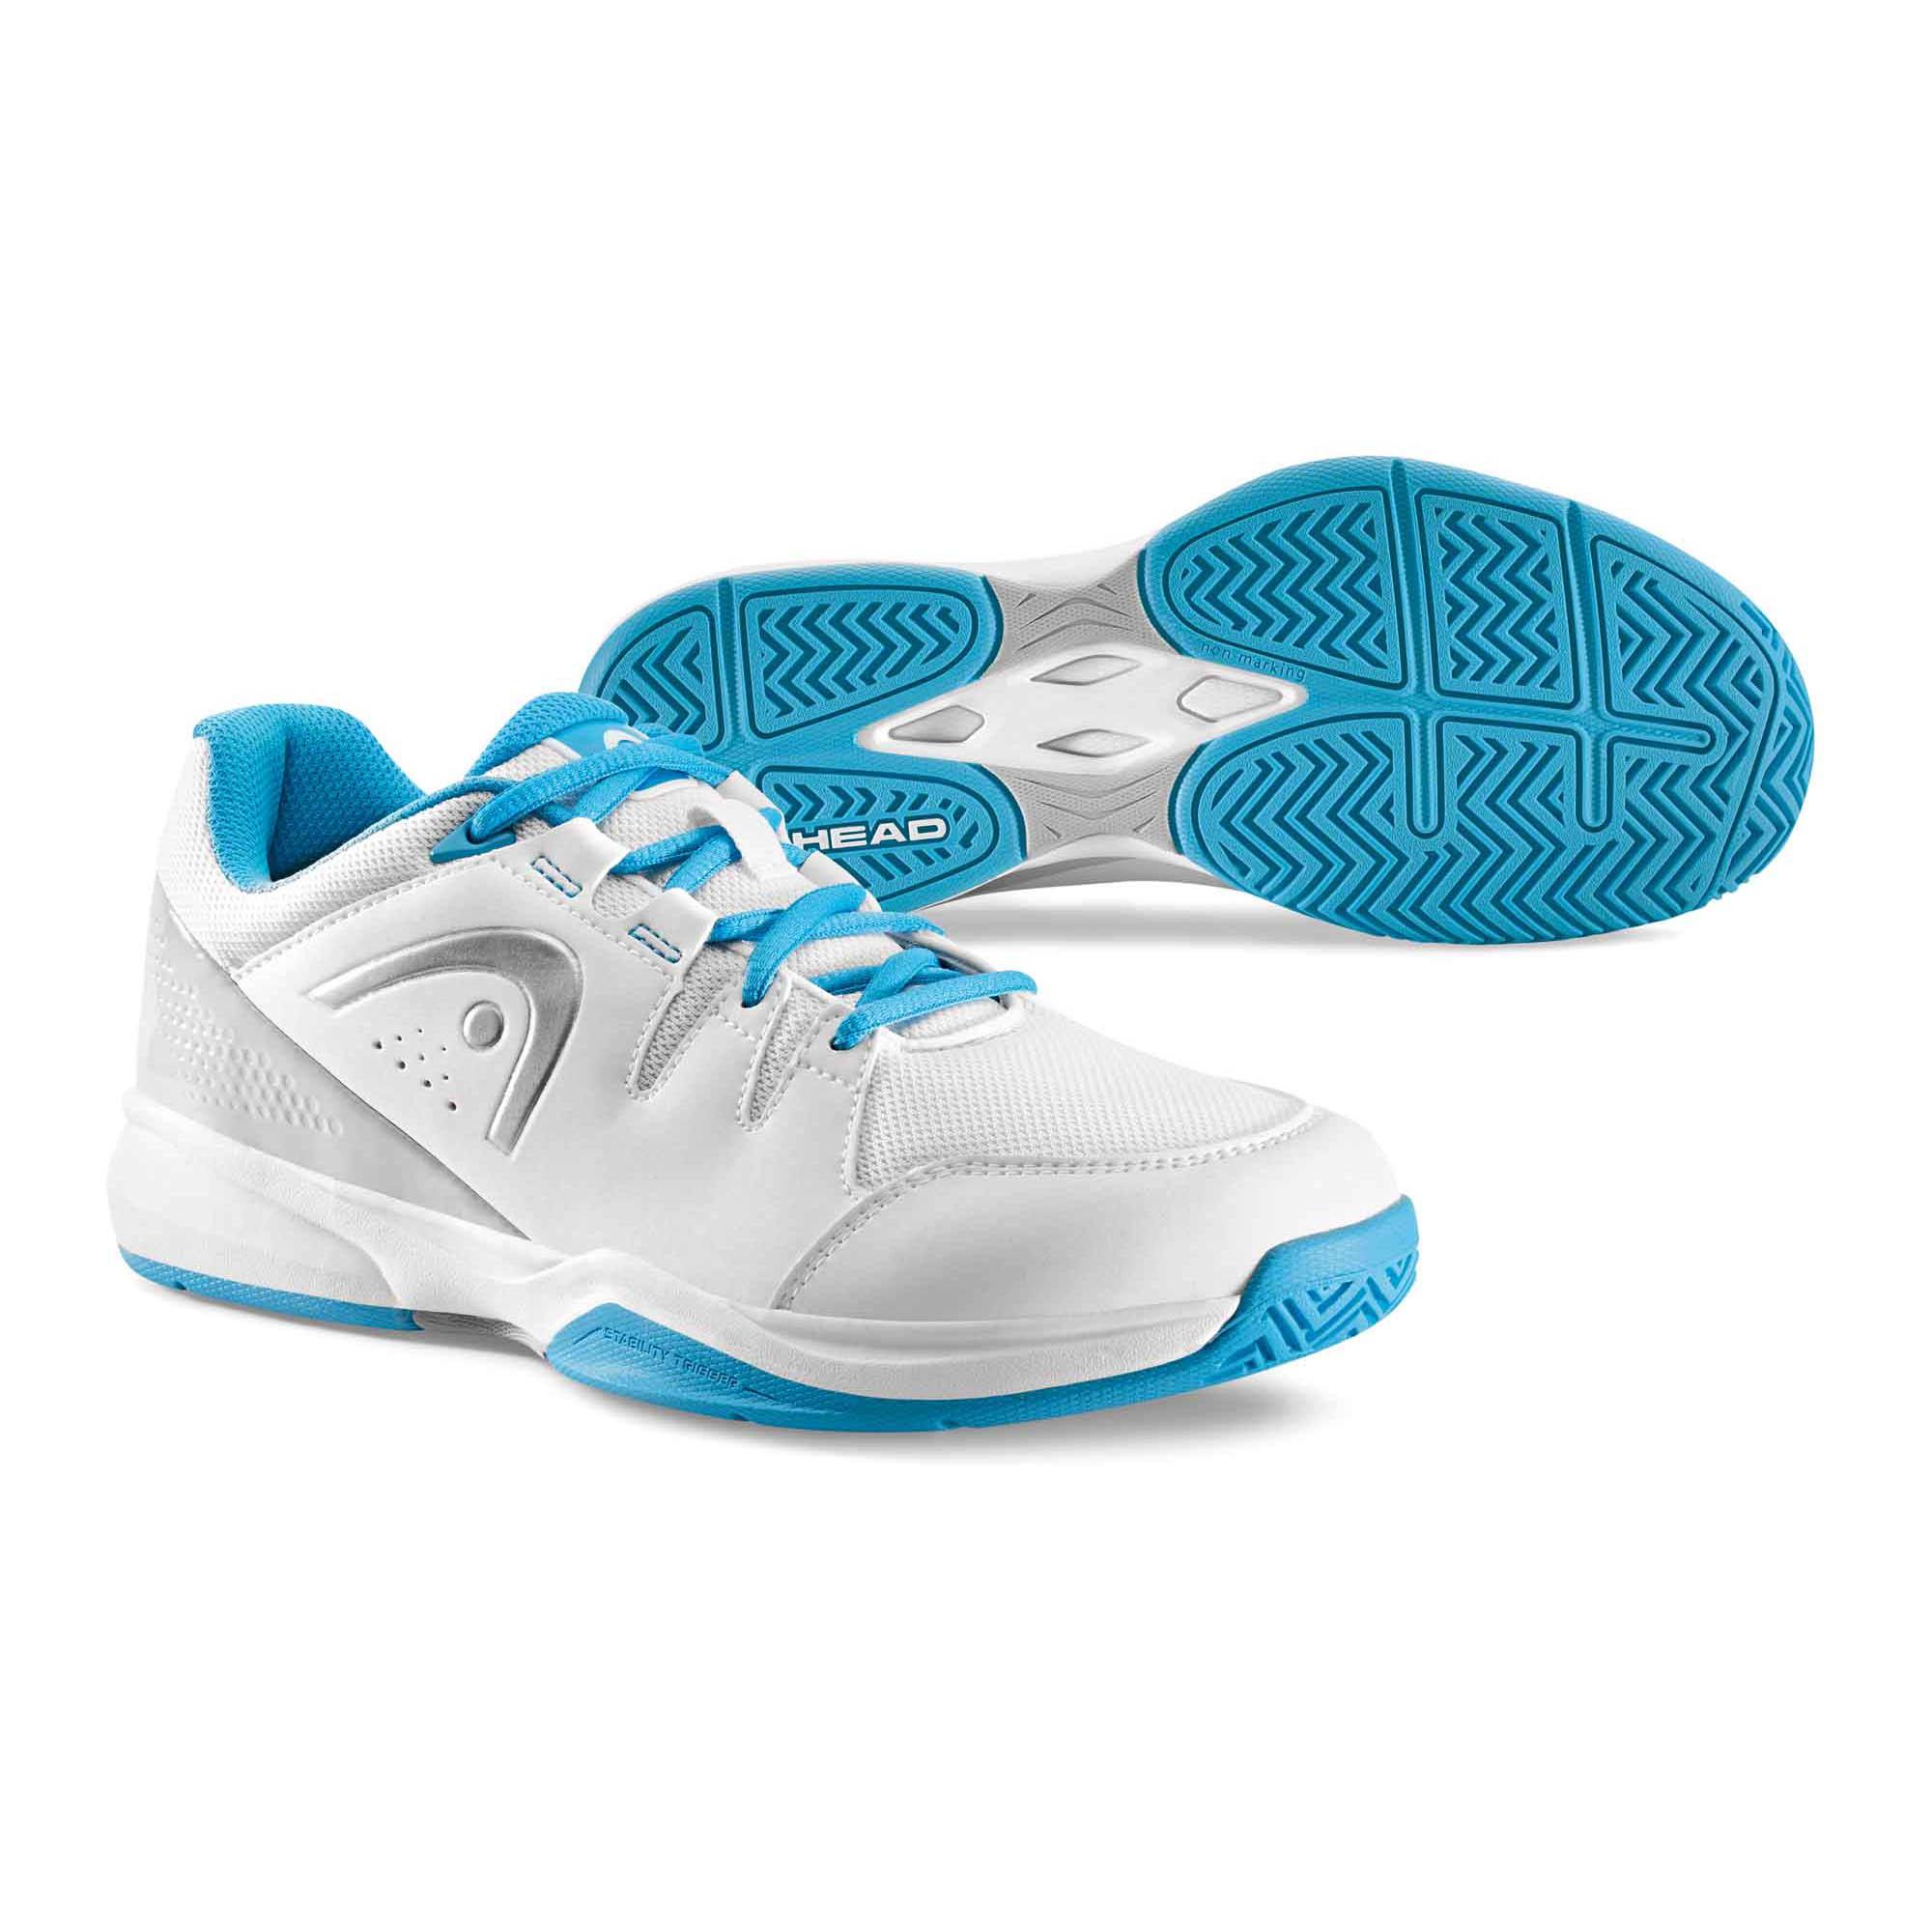 Head Brazer Ladies Tennis Shoes  4.5 UK